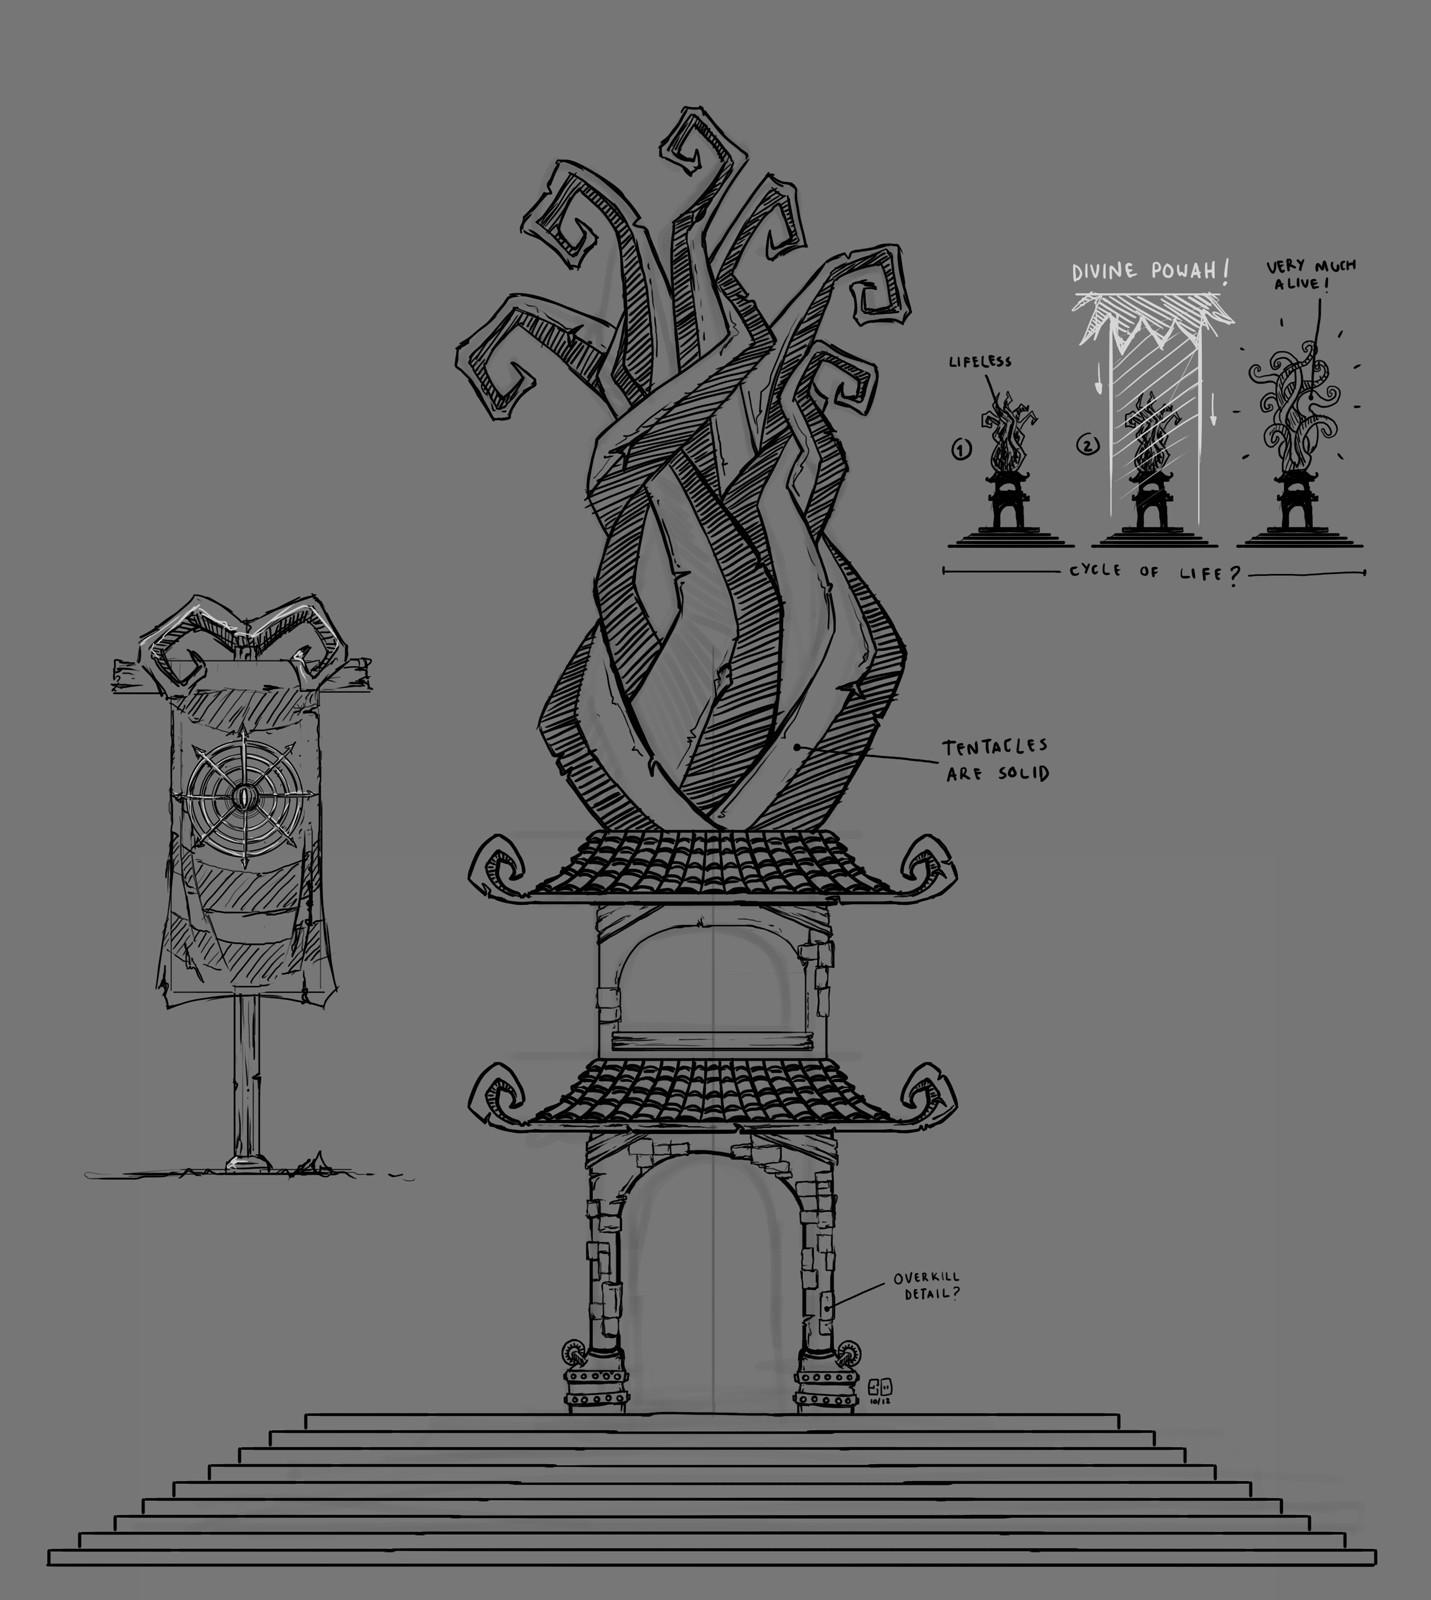 Eren ozel temple of ysel detailed 1600x1431